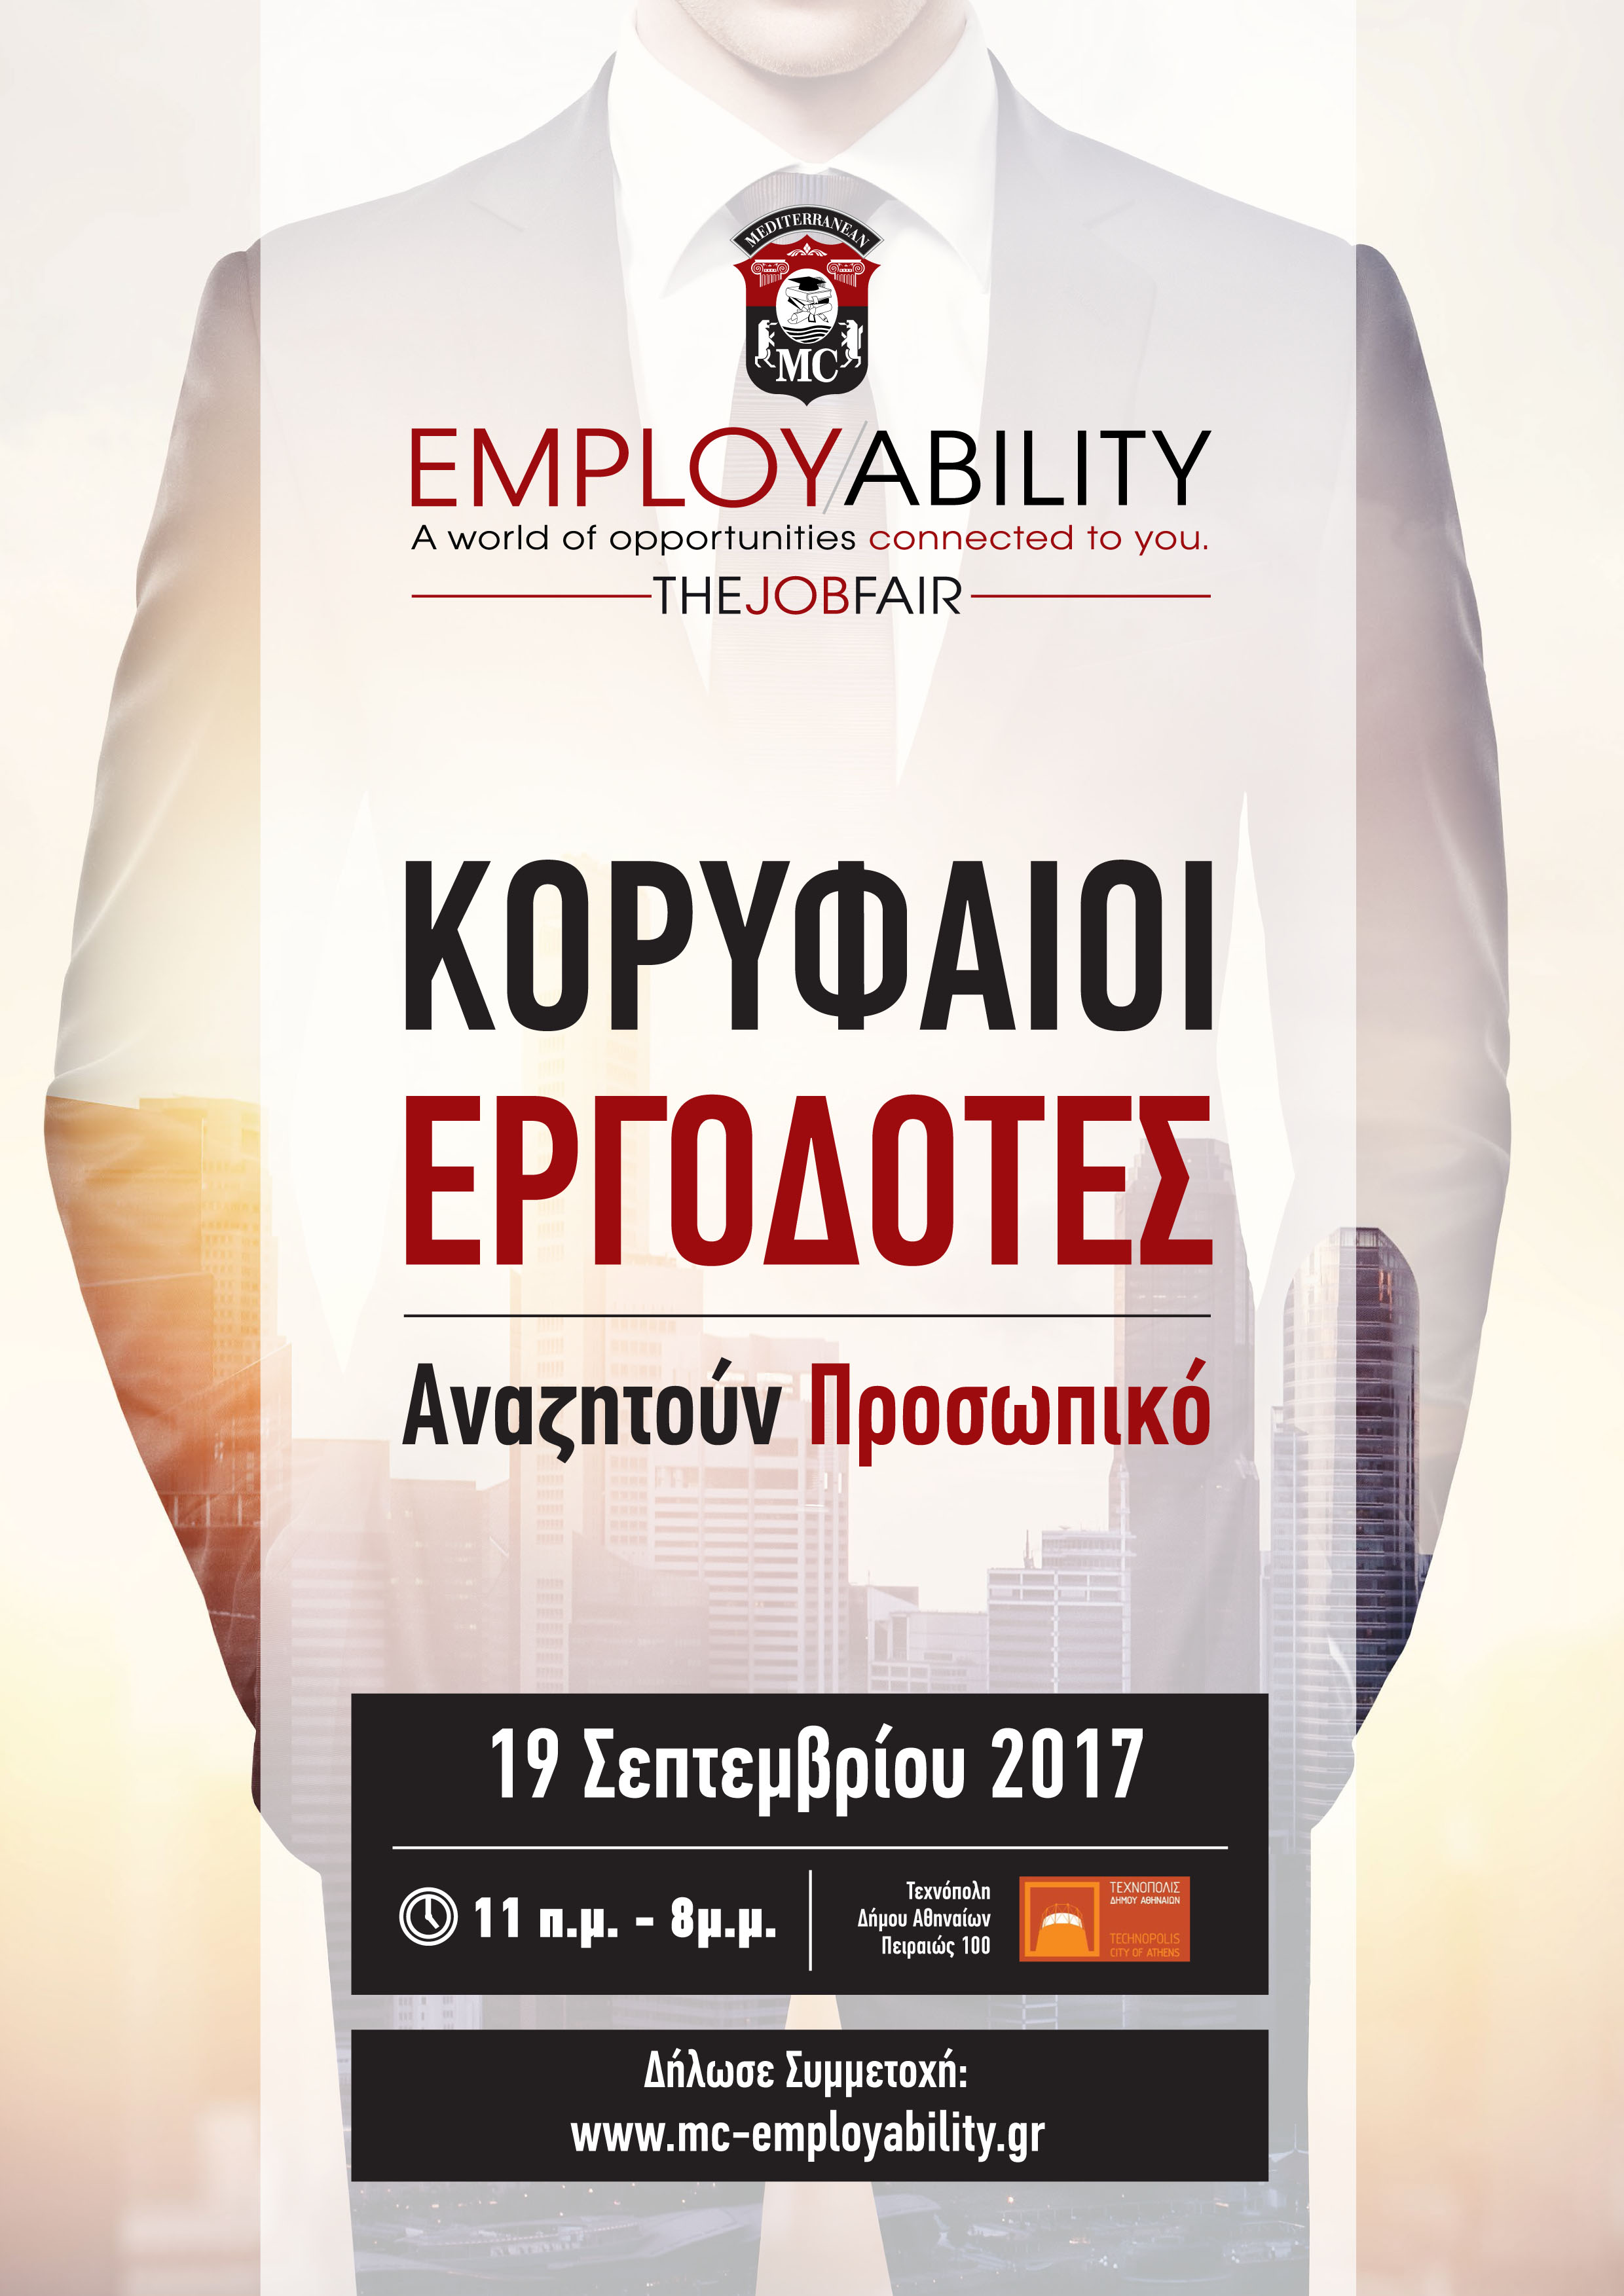 employability poster_2017_2